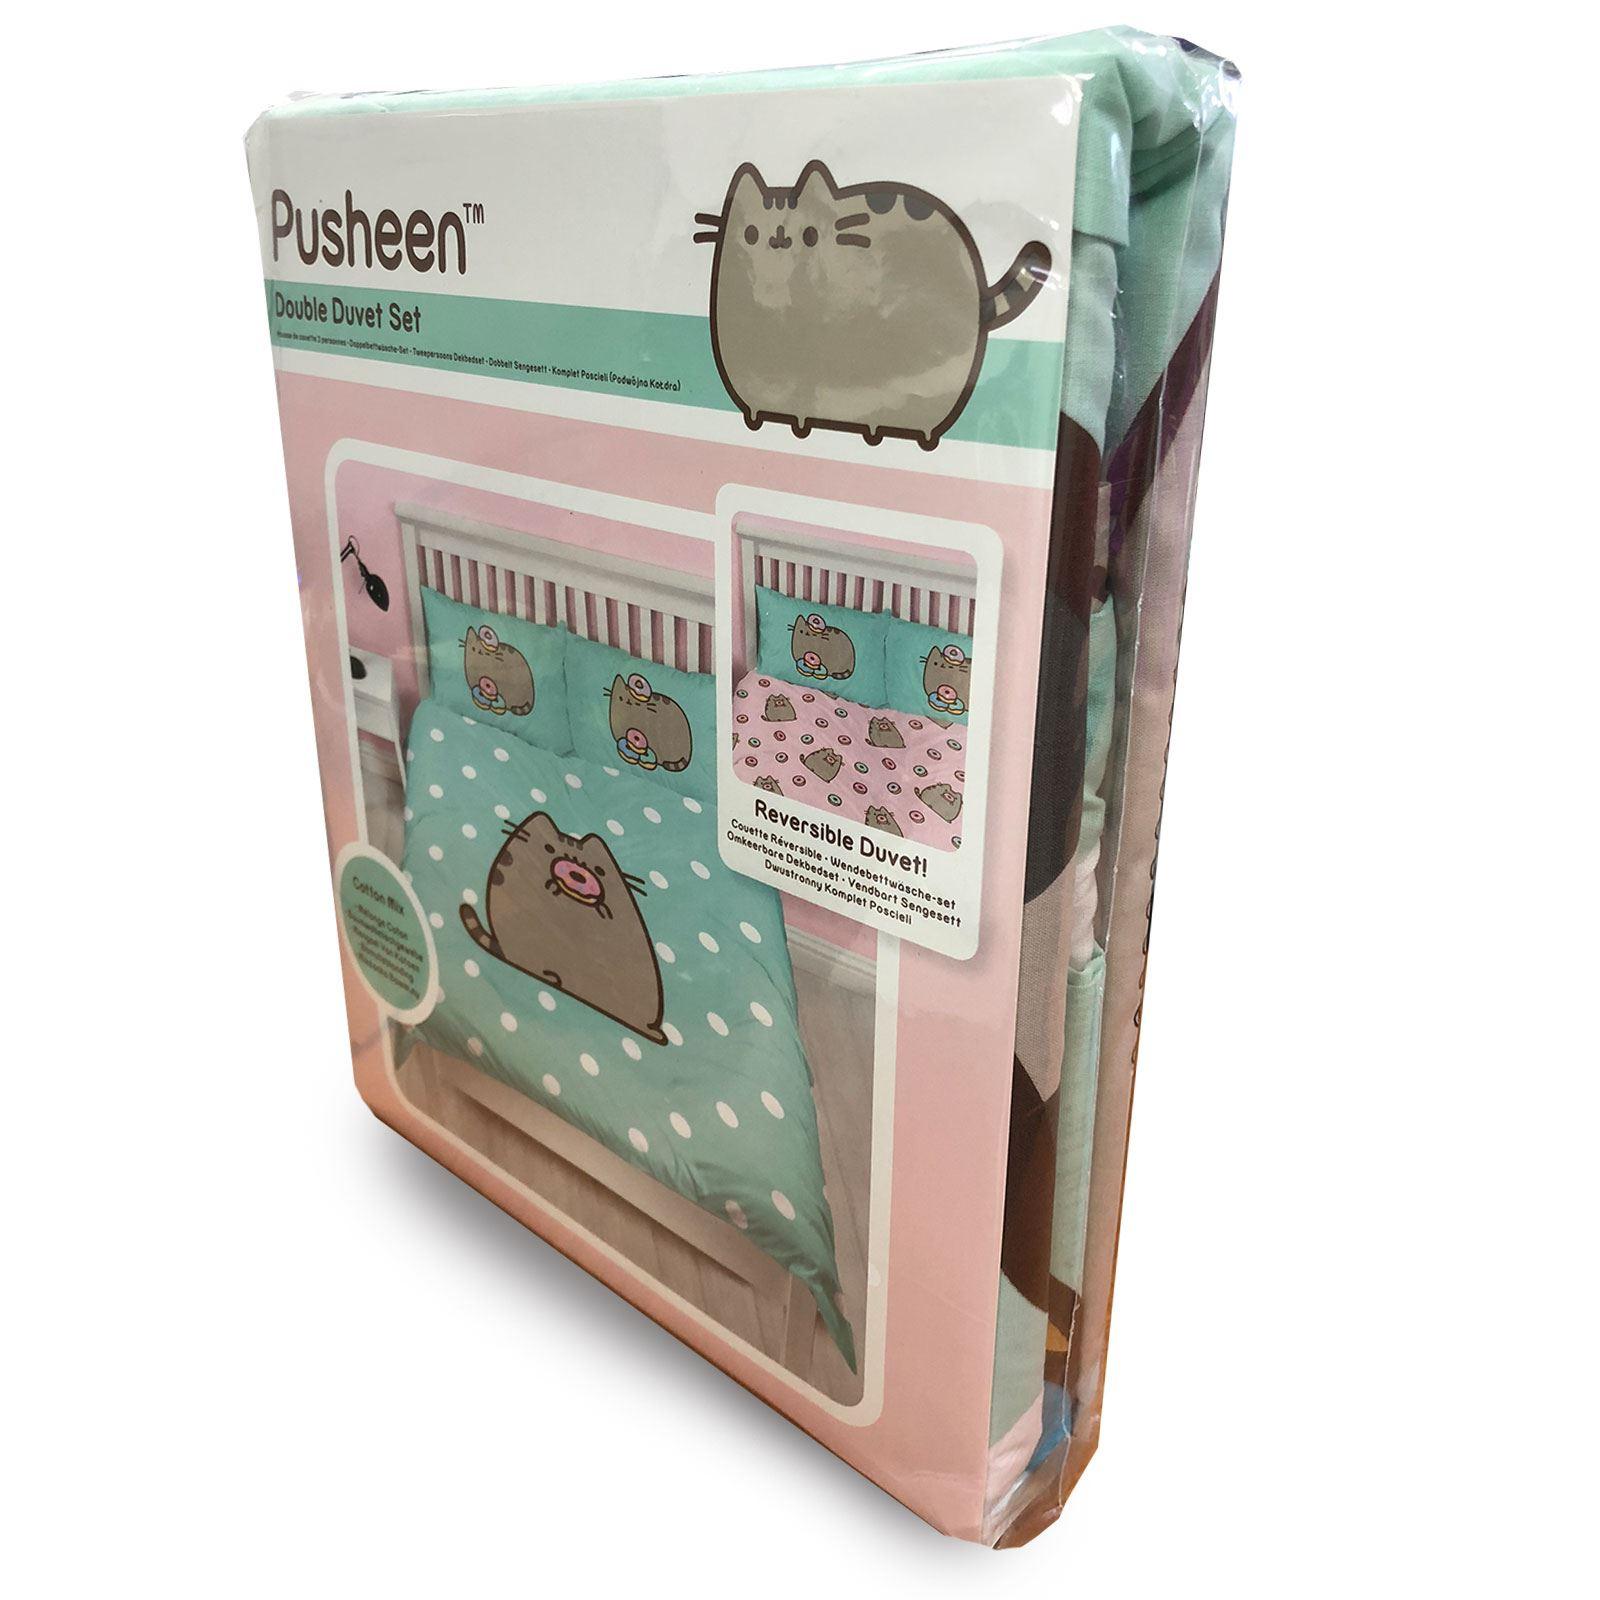 Primark New Pusheen Lazy Cat Double Duvet Size Cover Set Bedroom BNIP